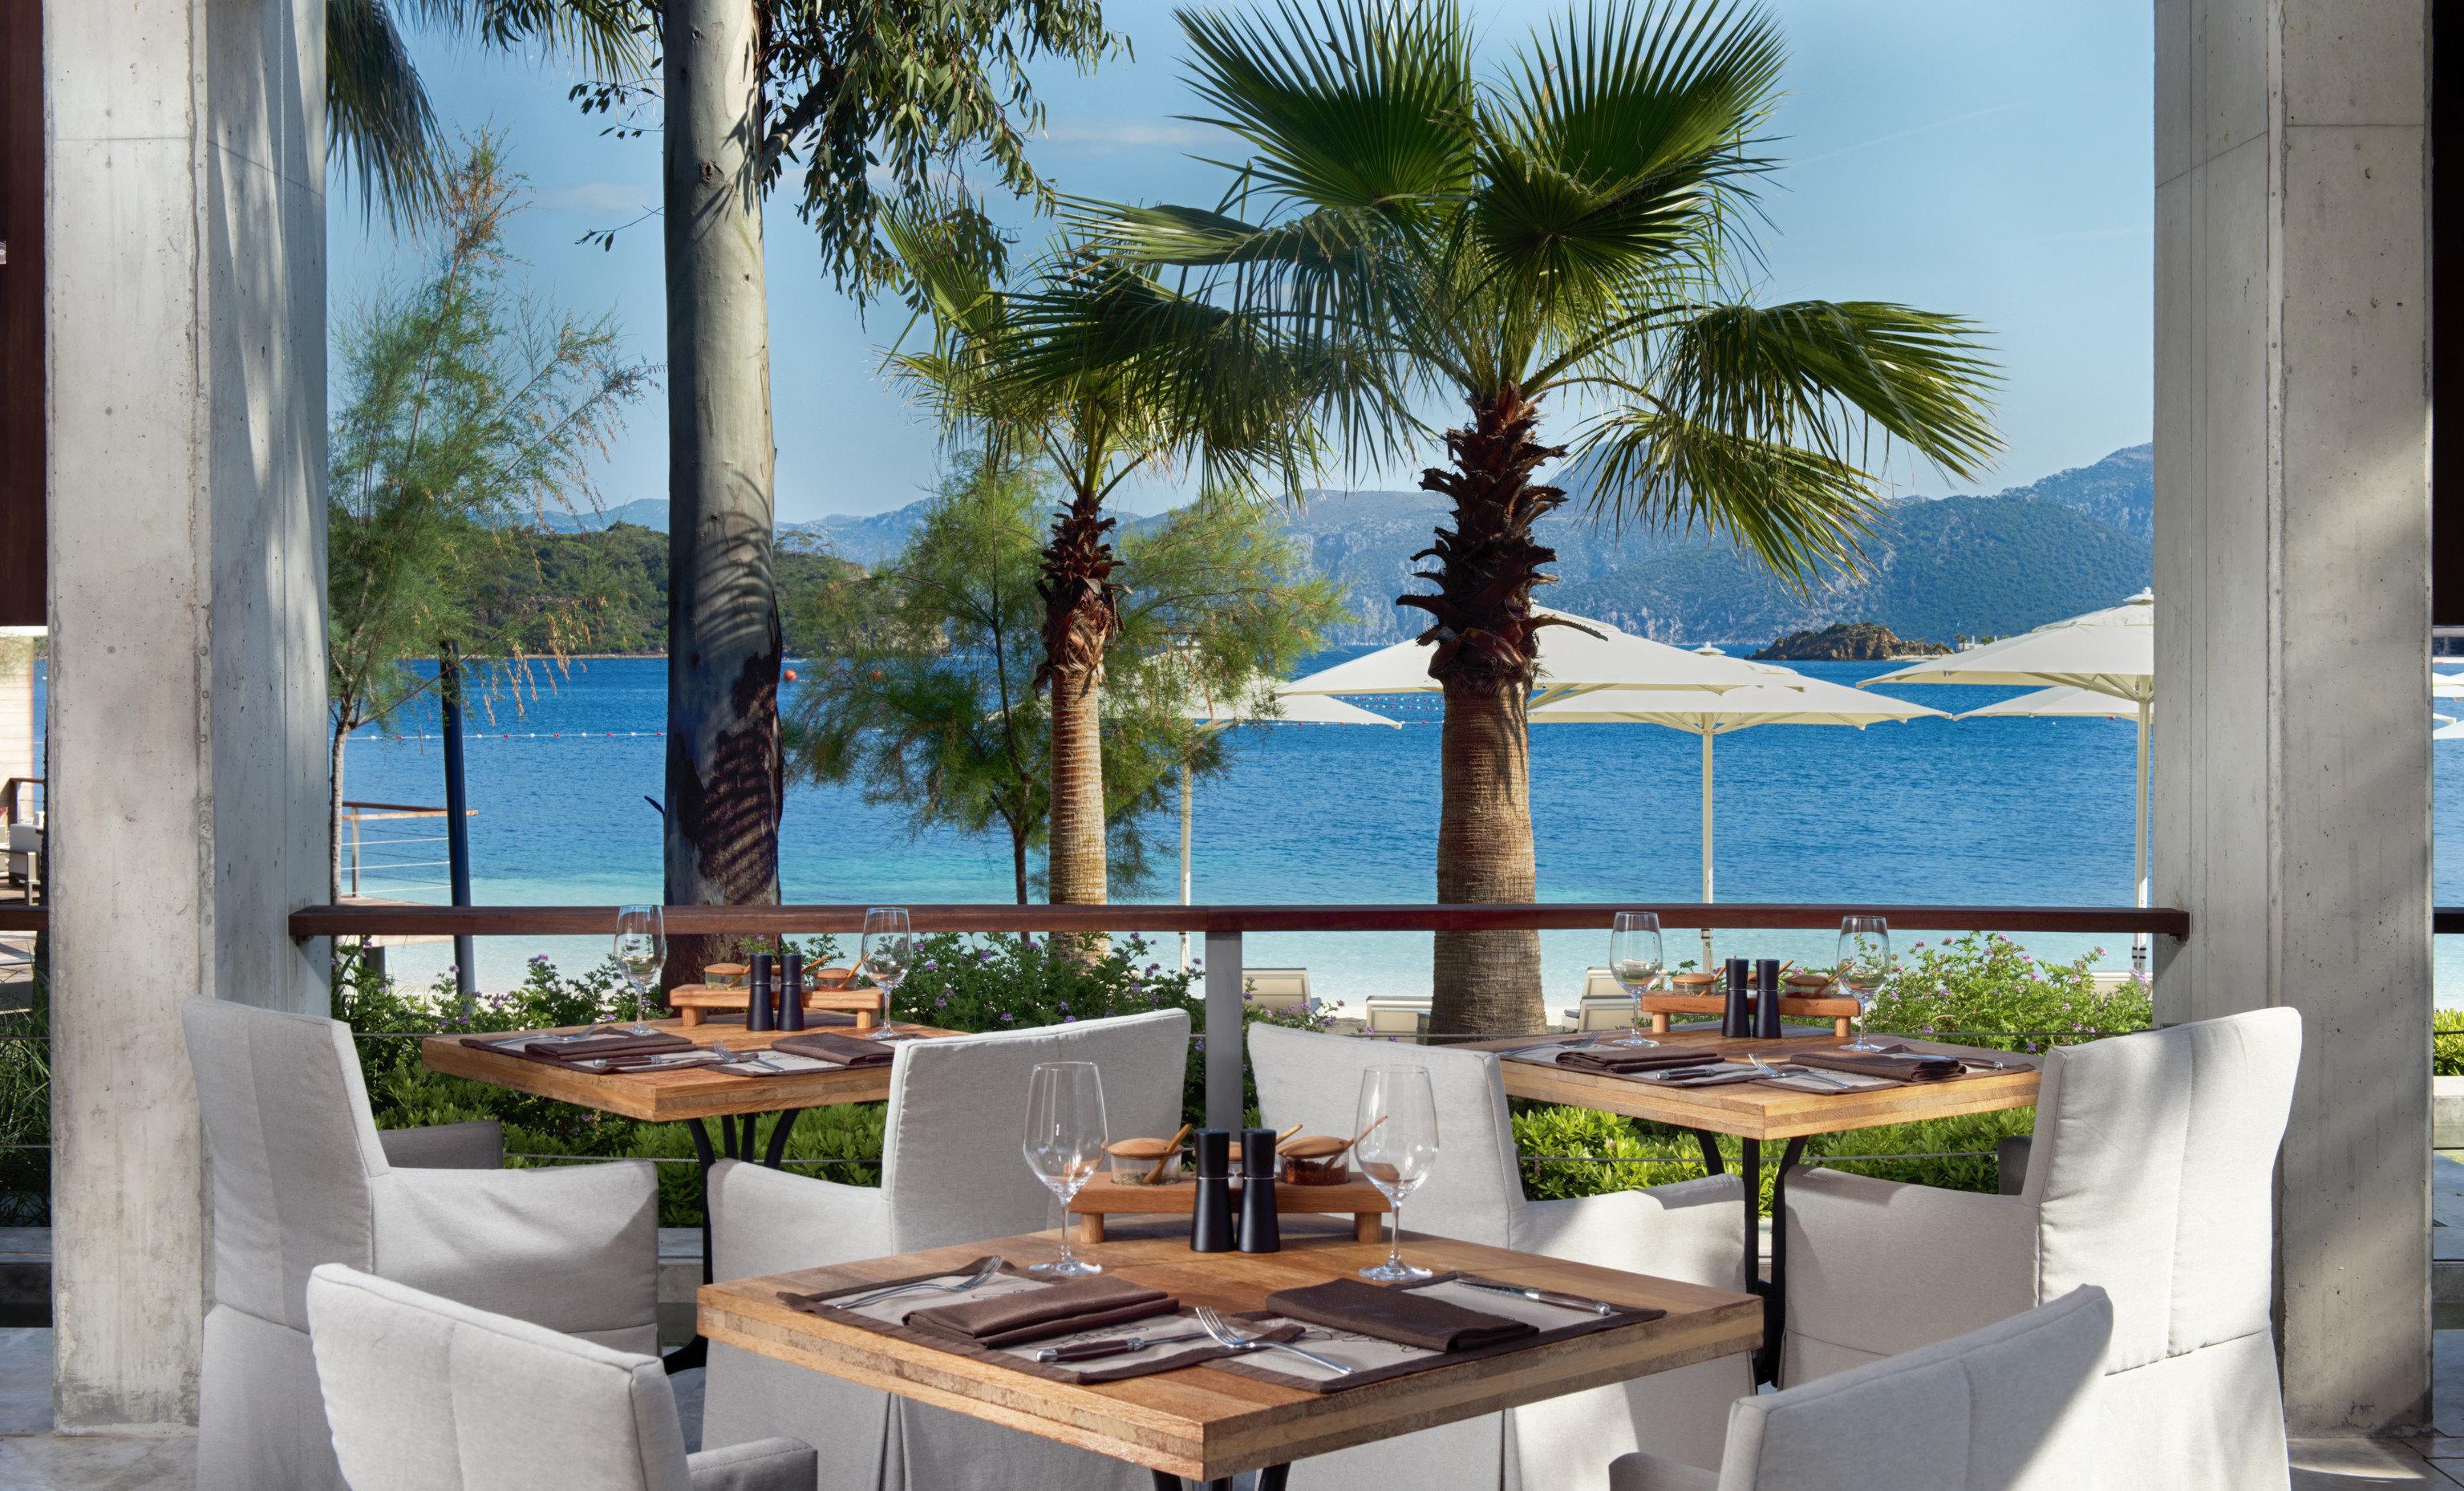 tree property condominium house home Resort Villa caribbean arecales swimming pool palm cottage mansion